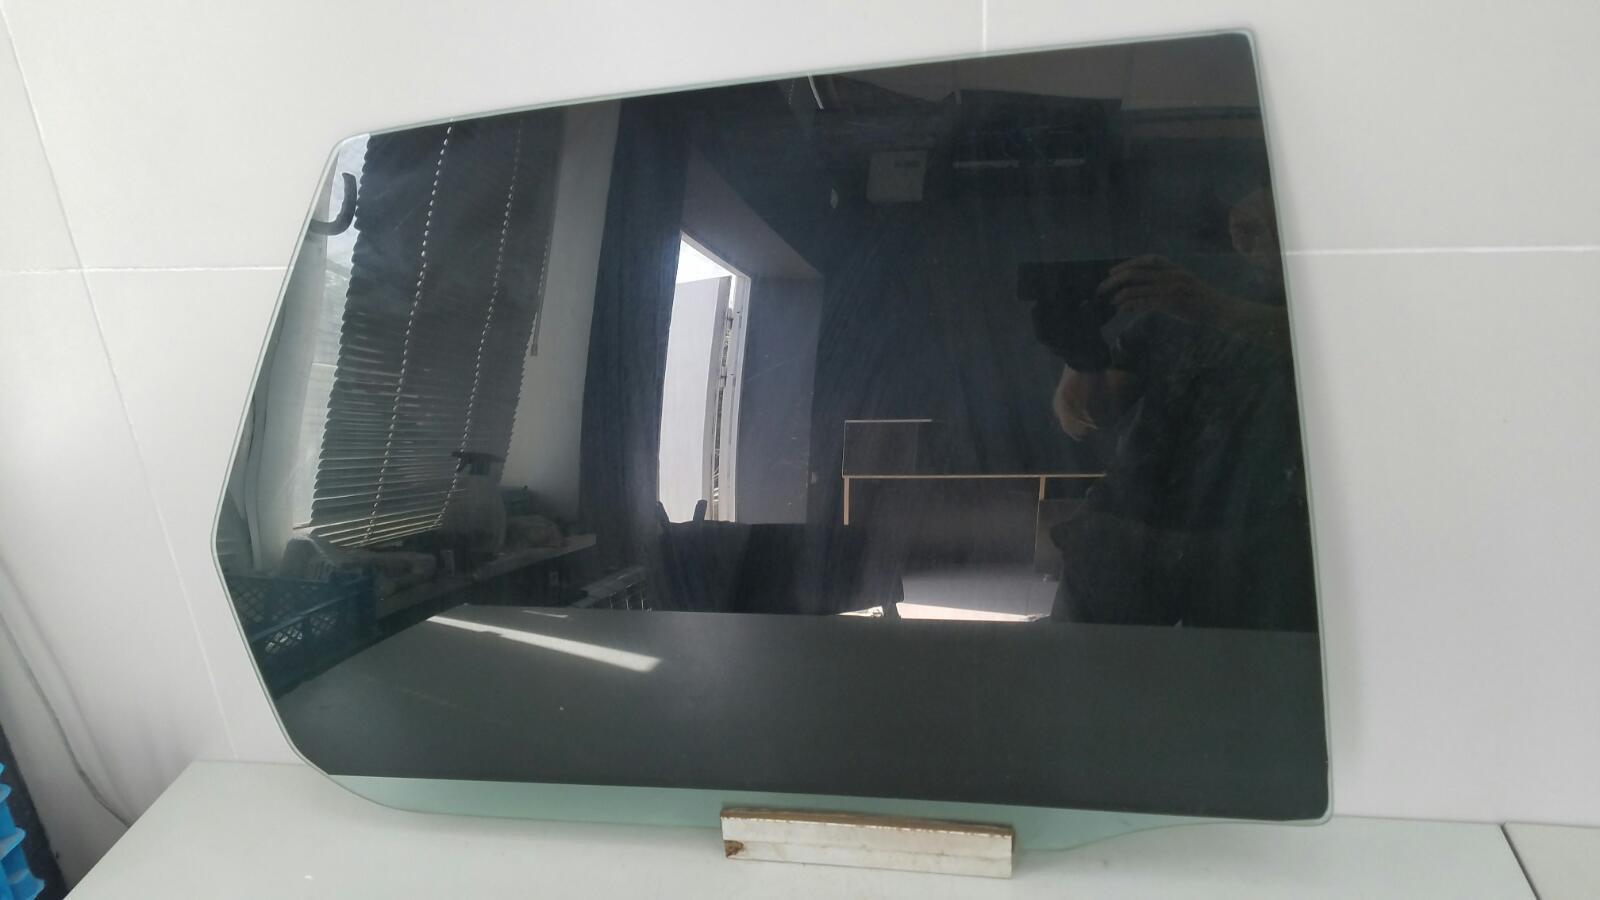 Стекло двери Opel Vectra A 86_ C18NZ 1.8Л 1992г заднее правое